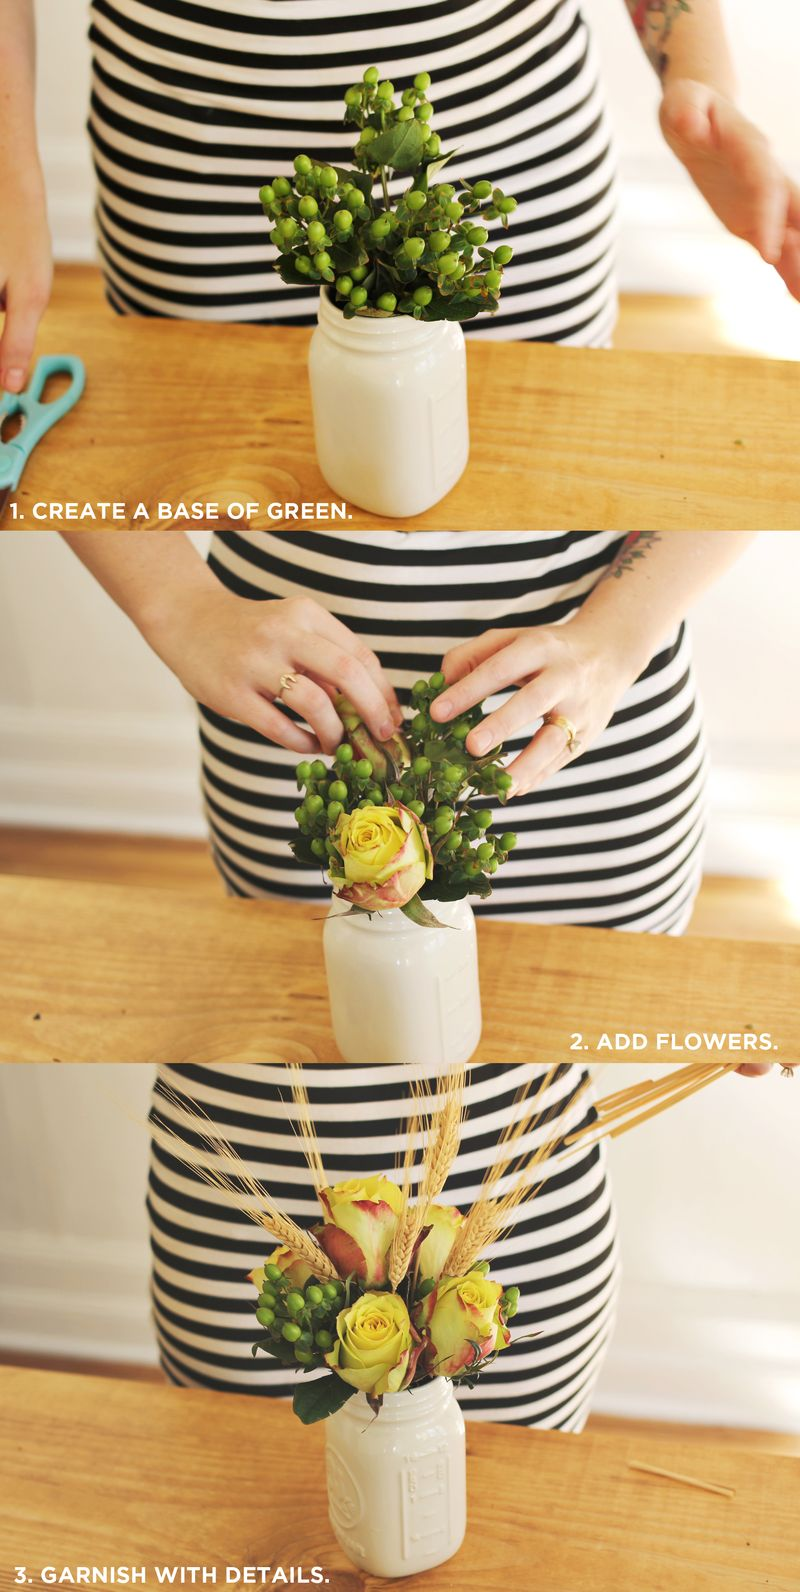 How to create a basic flower arrangement